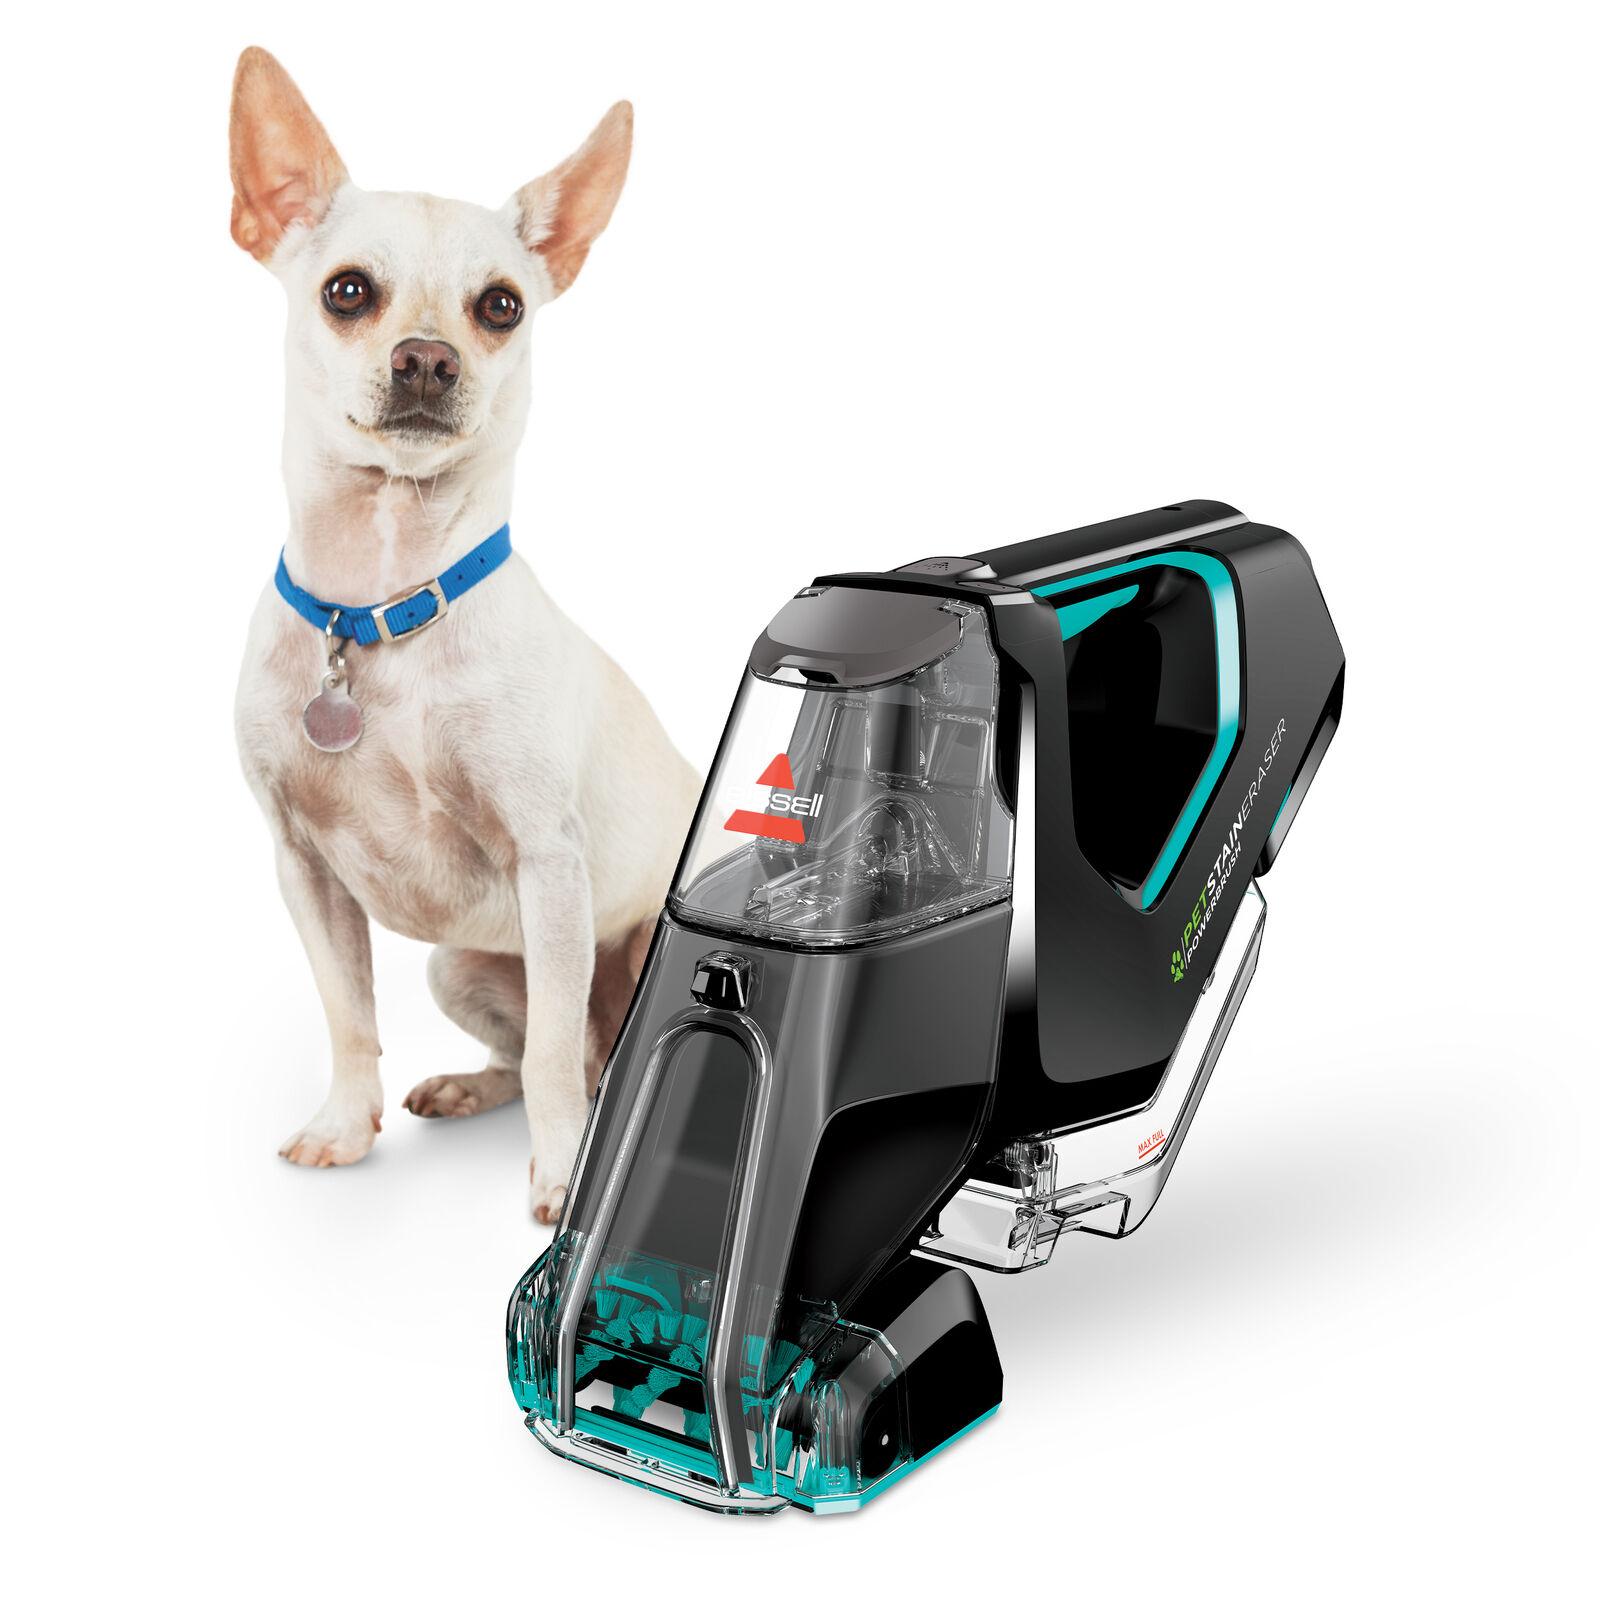 Bissell Pet Stain Eraser PowerBrush Portable Carpet Cleaner